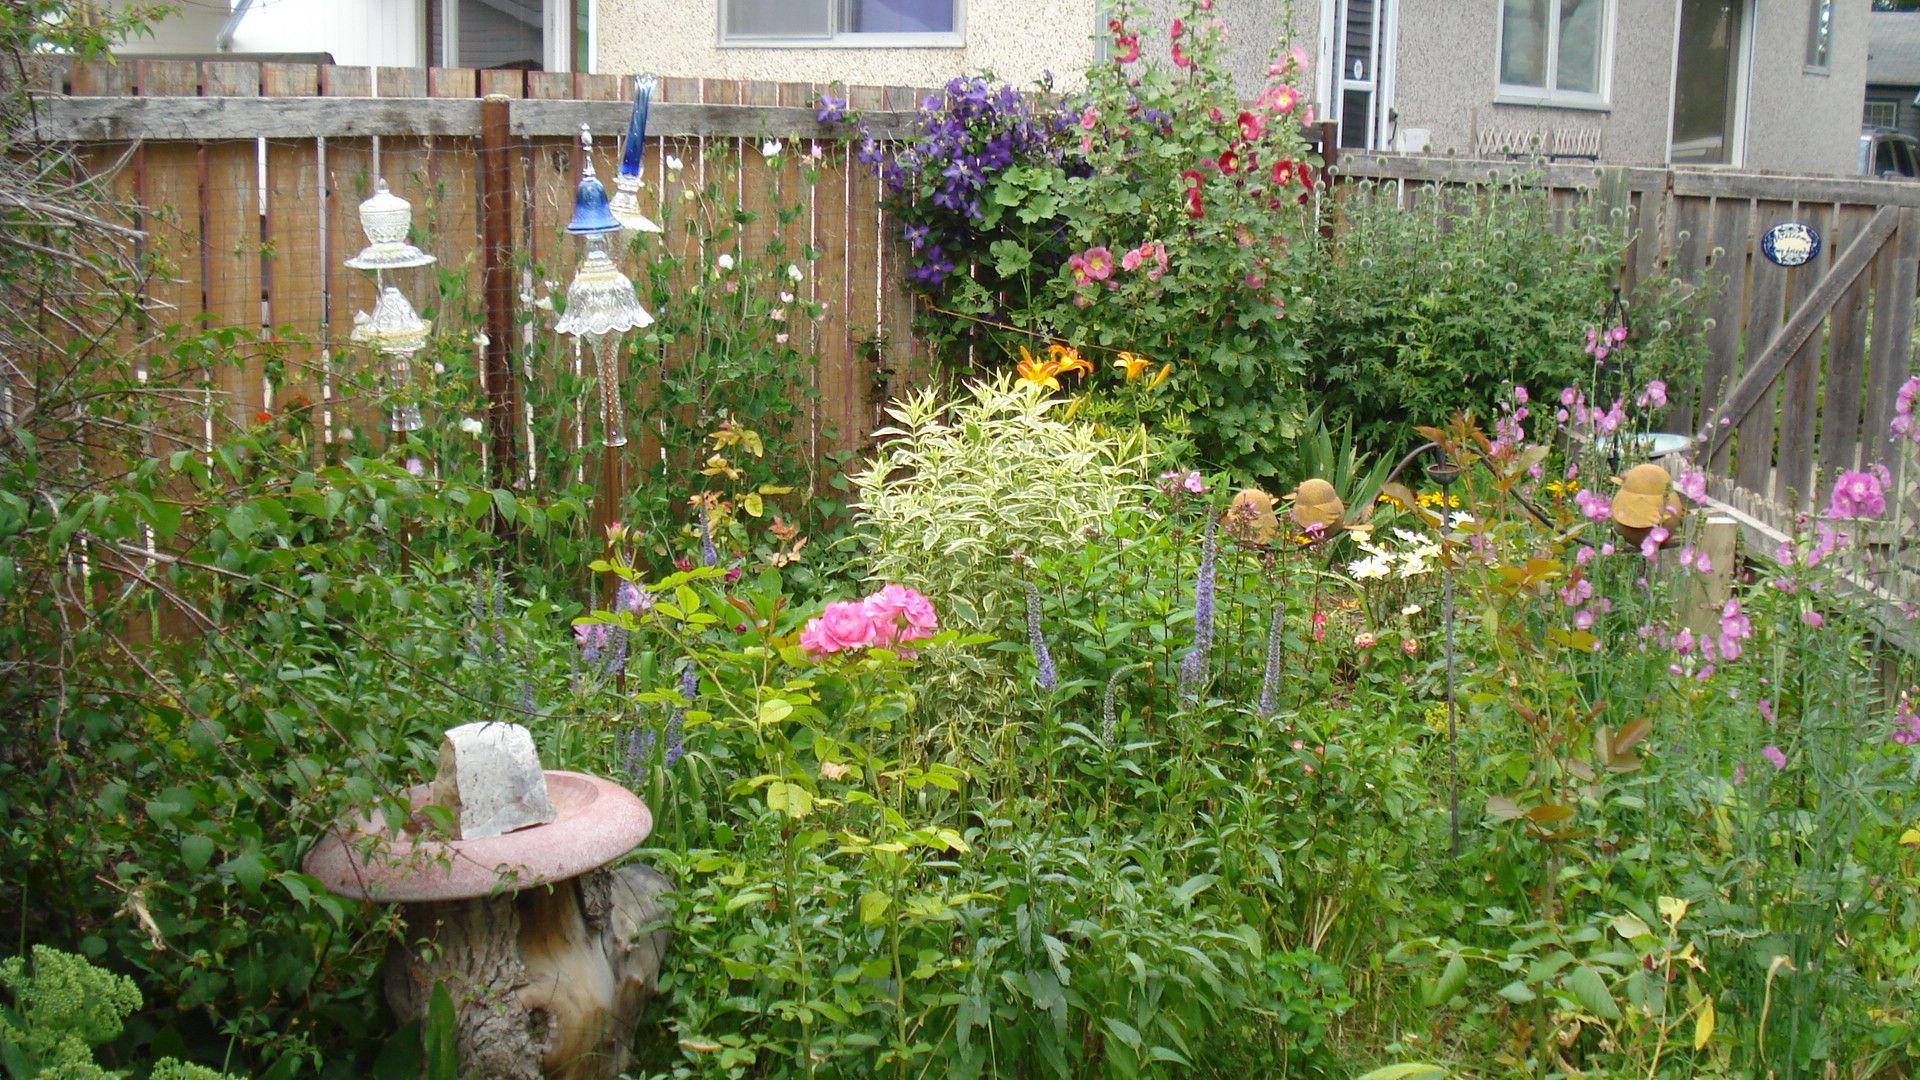 My little flower garden gardening ideas pinterest for Garden designs pinterest